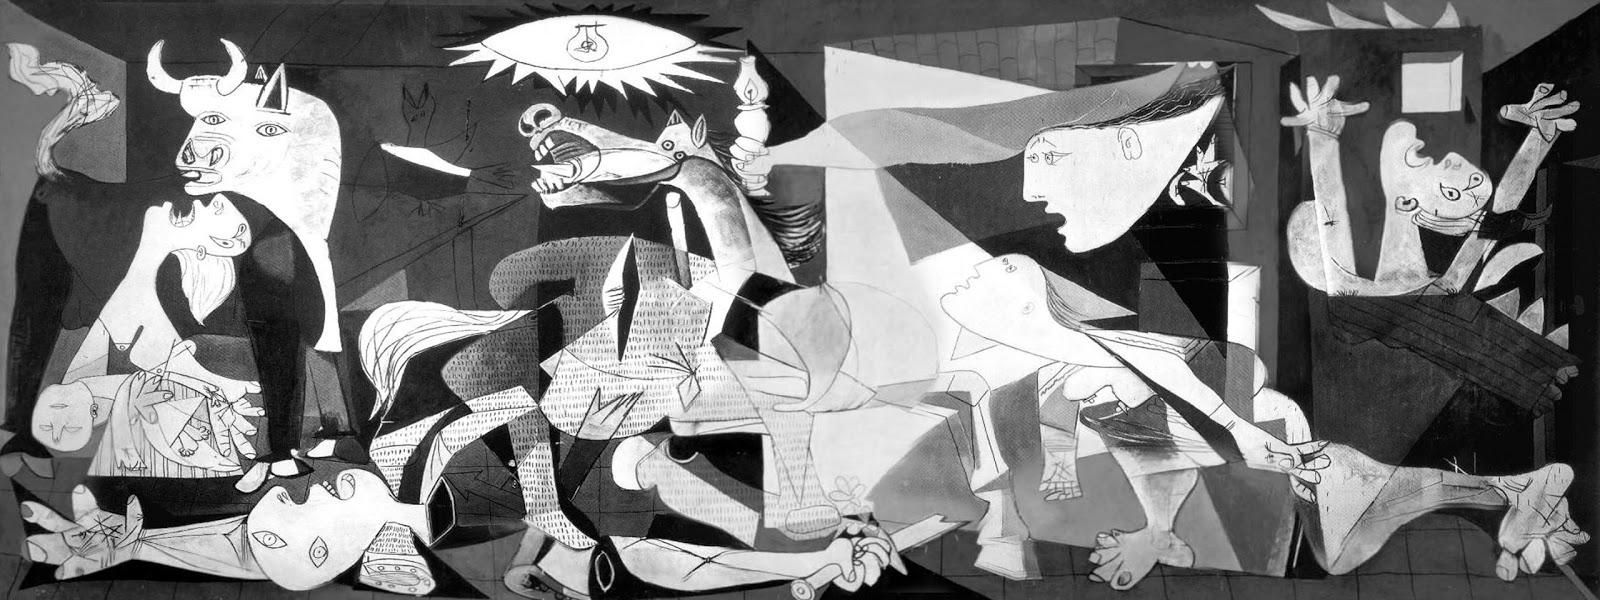 telas_pinturas_obras_picasso_Guernica_pinturas_de_picasso_pinturas_do_a'uwe